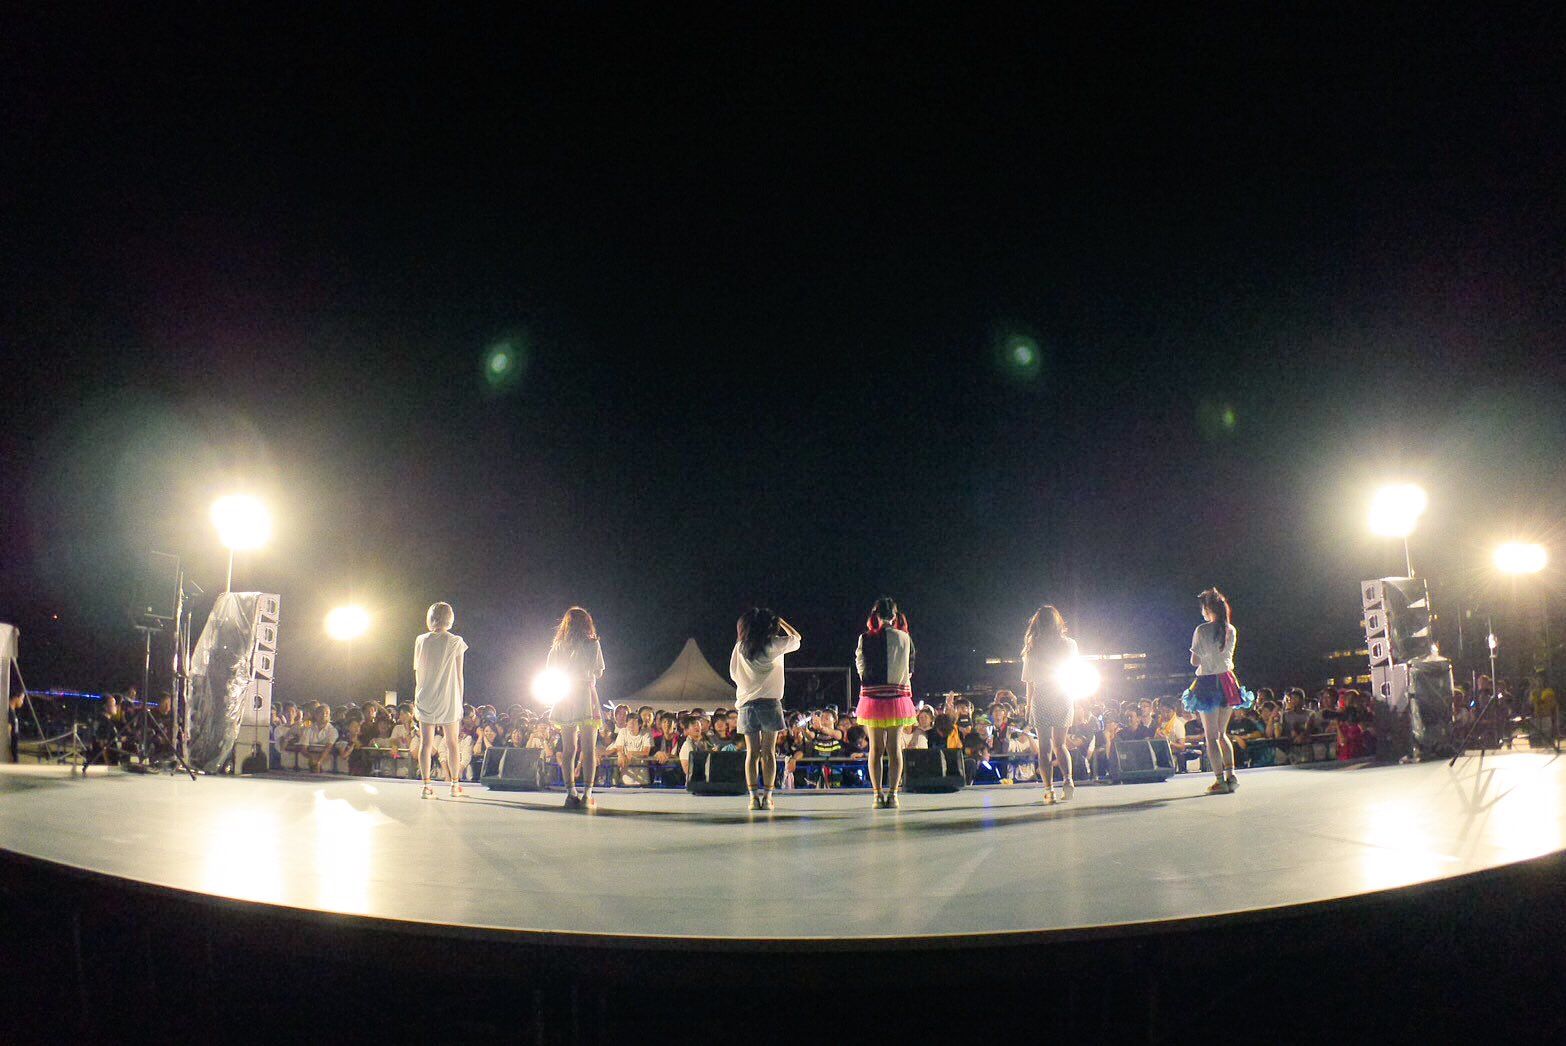 TIF2016 1日目 妄想キャリブレーション  @SKY STAGEのトリを務めさせていただきました!  #TIF2016 https://t.co/HLPy8i7LJO